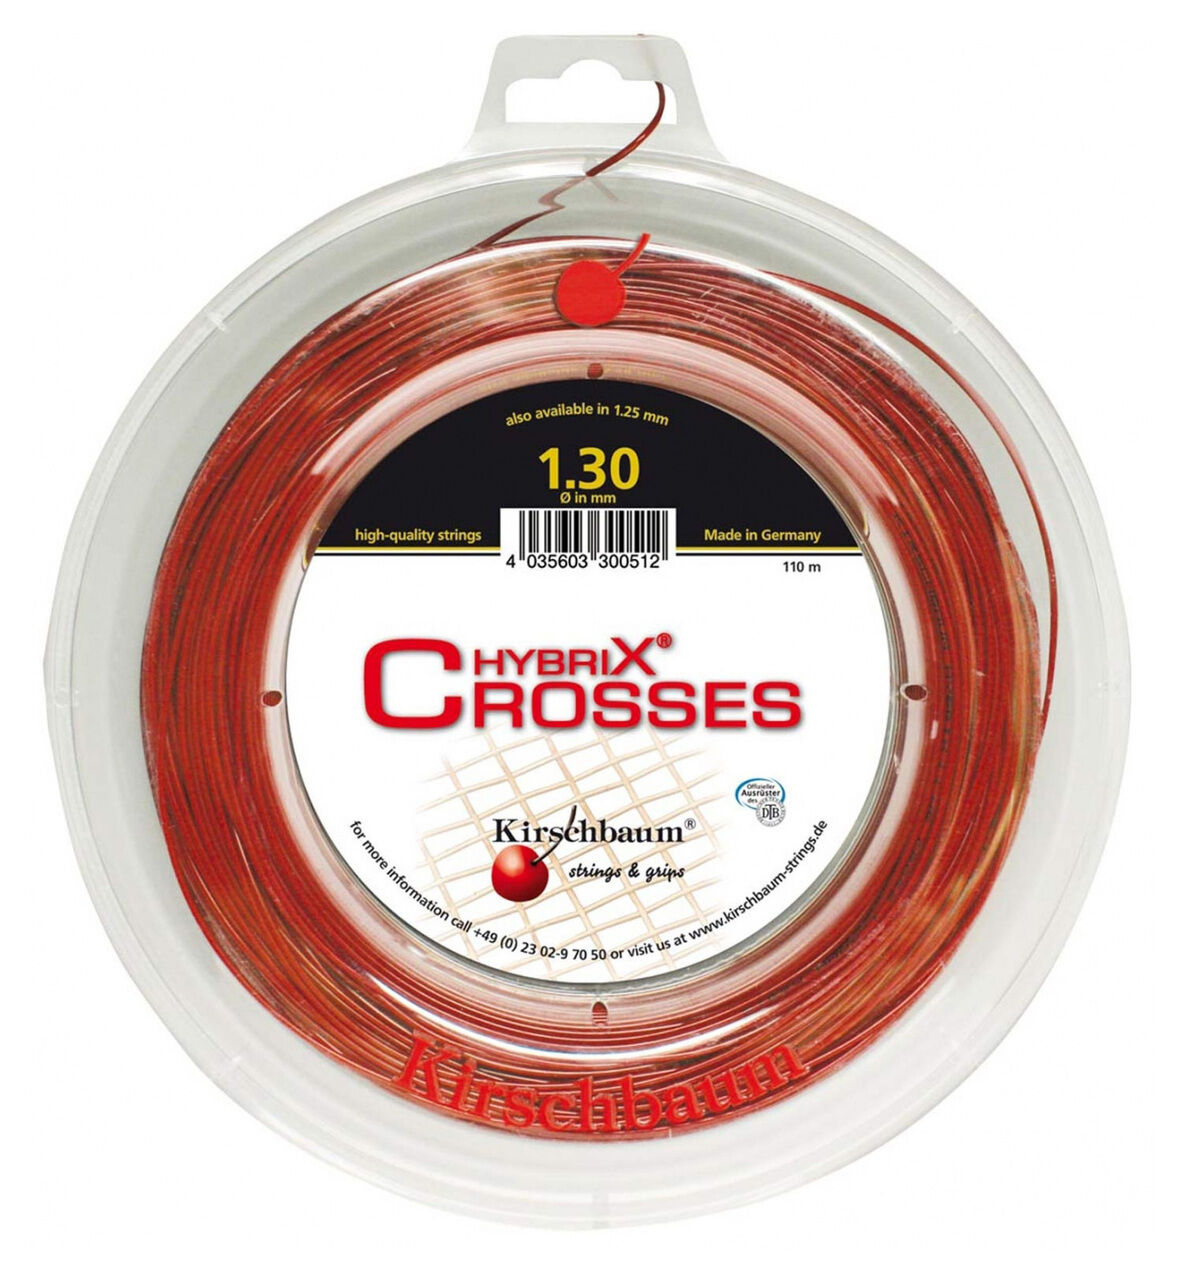 Kirschbaum HYBRIX Power Croci Tennis Stringa 110m REEL